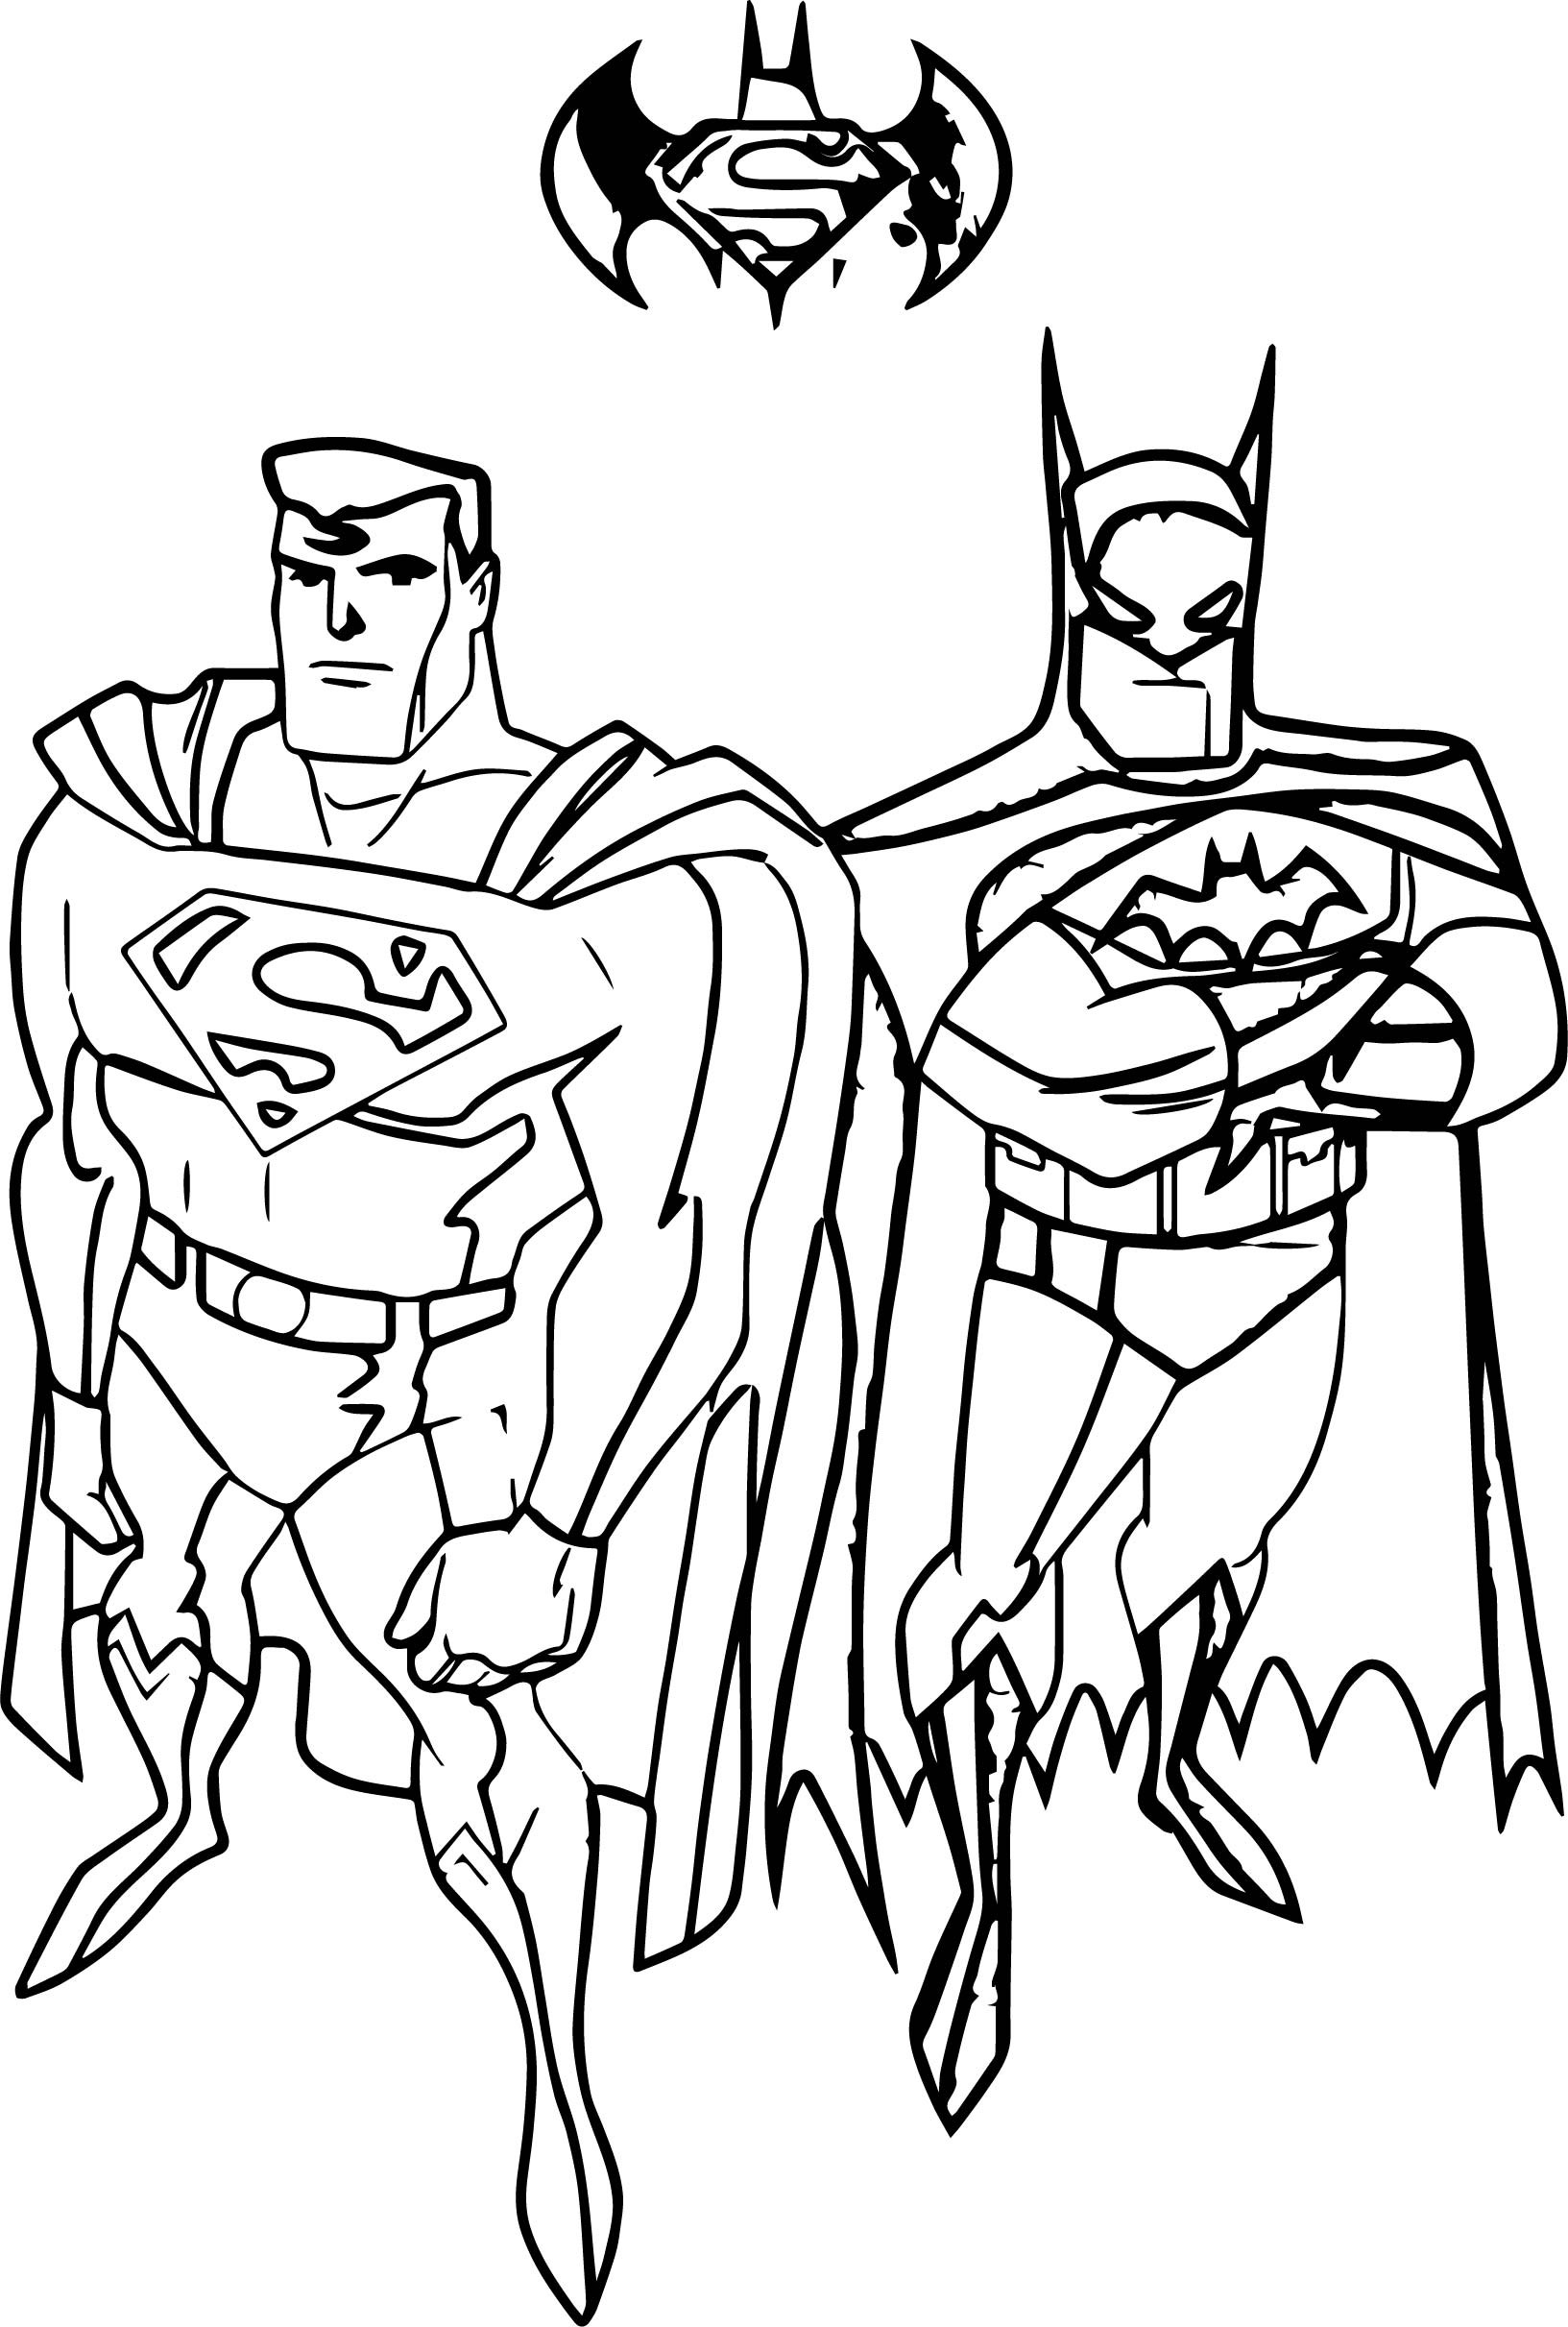 batman printing pages batman coloring pages 2 coloring pages to print pages batman printing